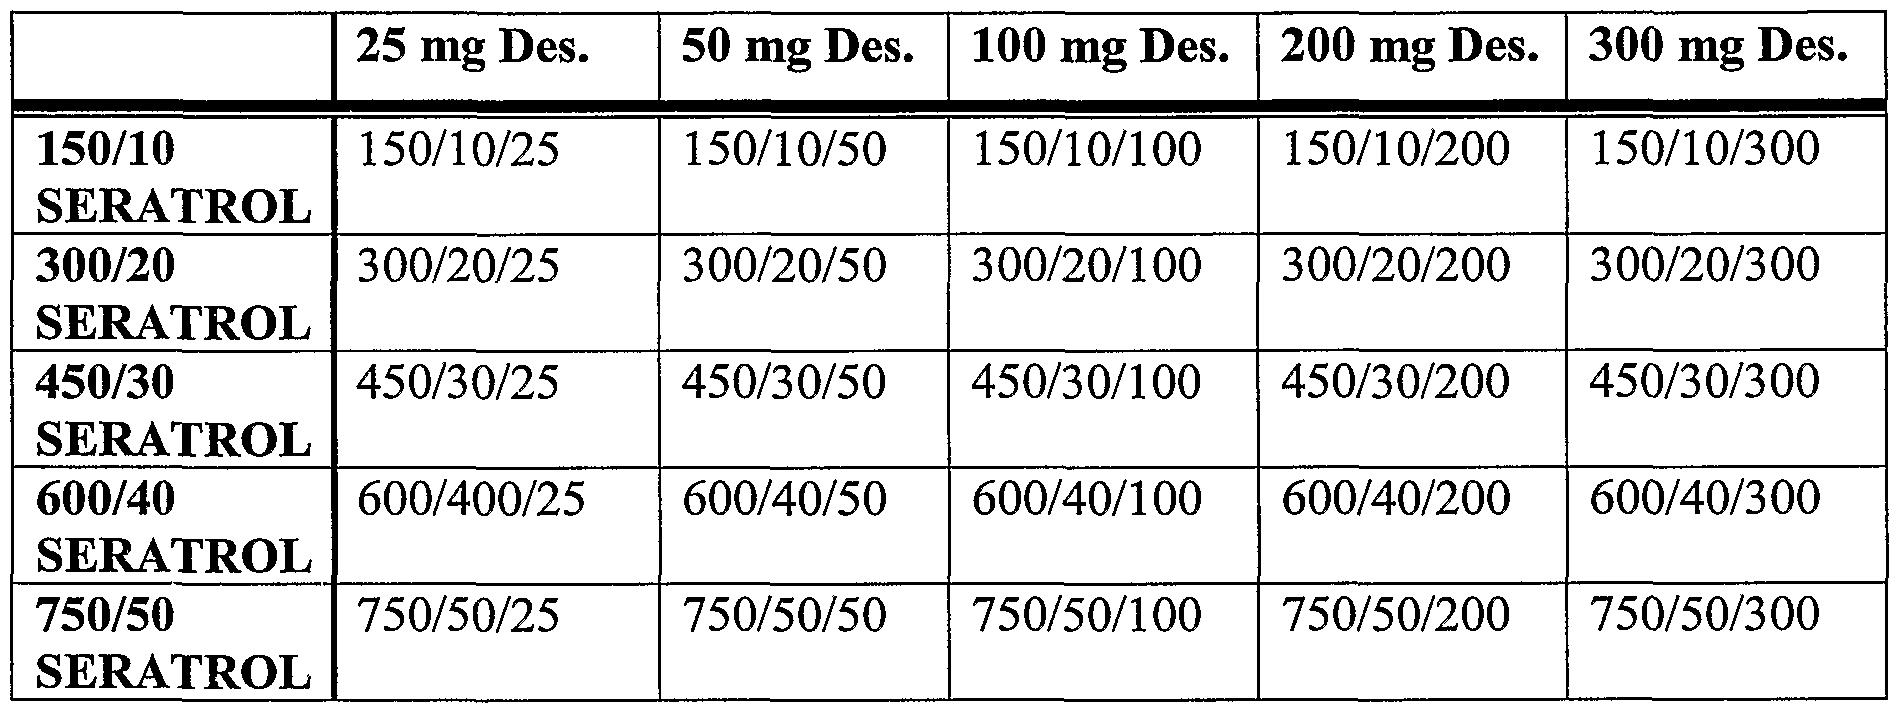 how to buy vepesid no prescription needed